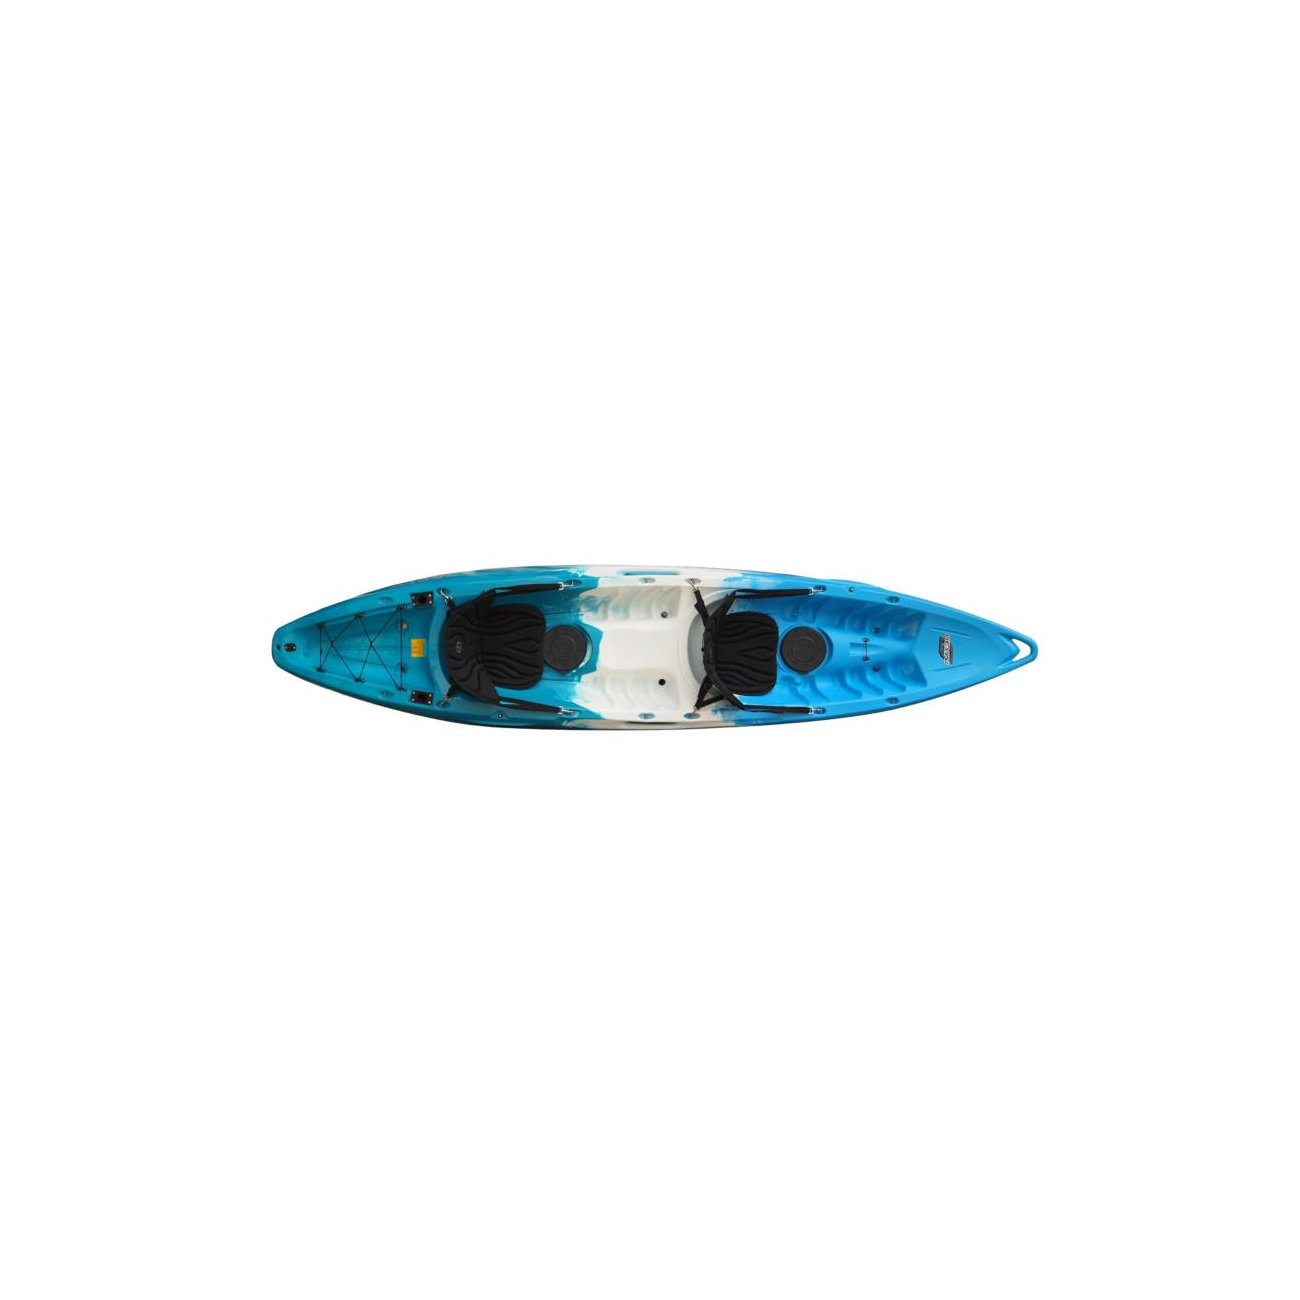 https://feelfreekayak.eu/599-small_default/gemini-sapphire-dark-blue-white-dark-blue.jpg